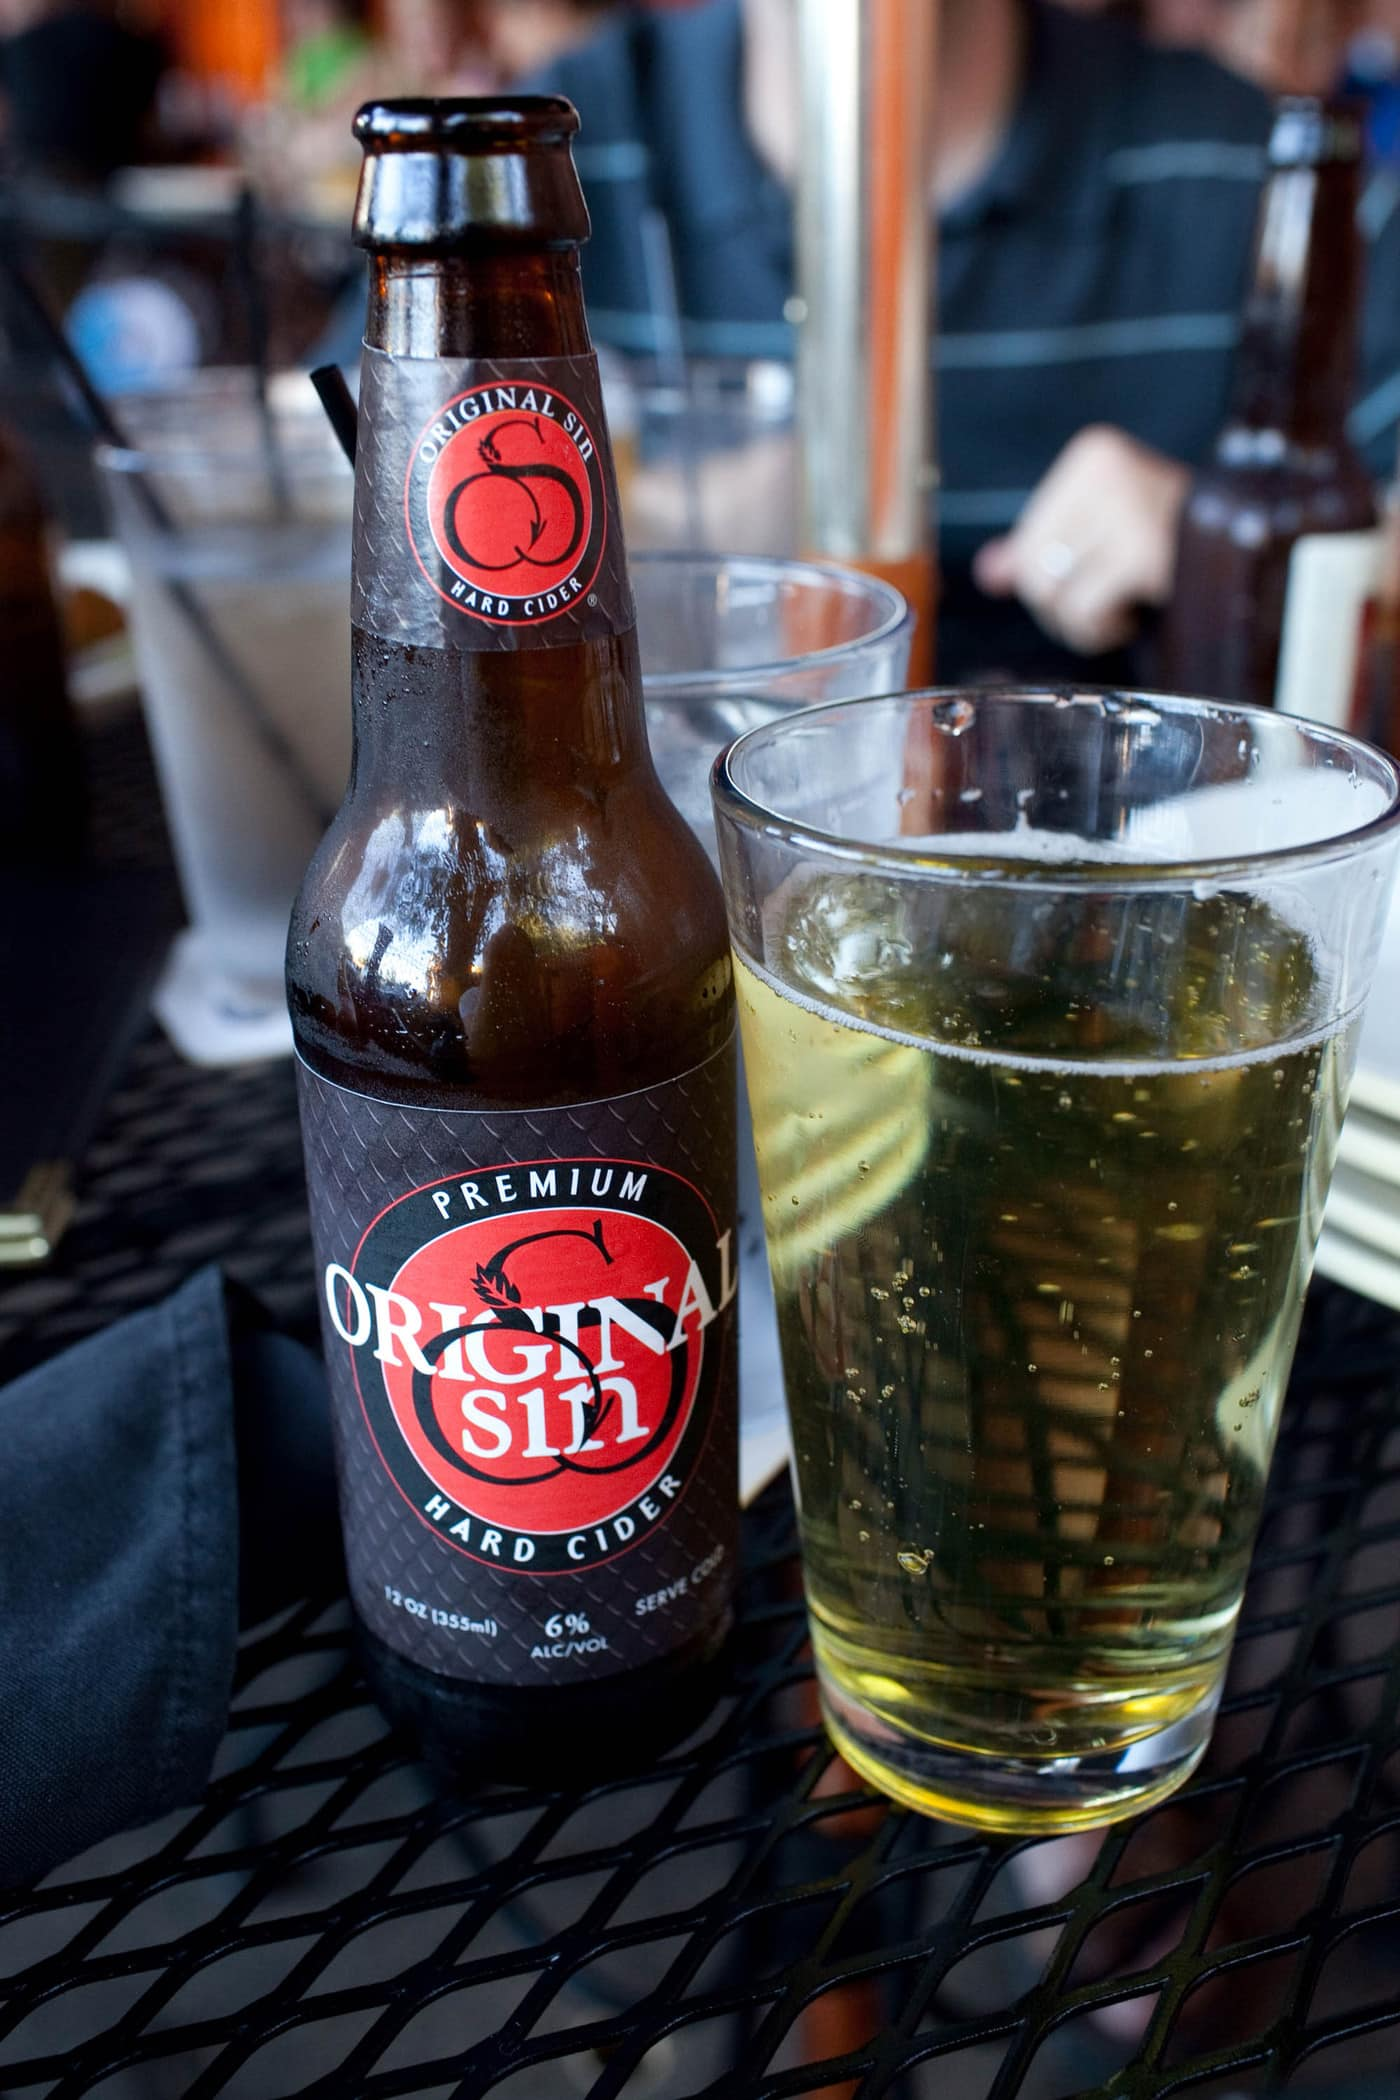 Kuma's Corner in Chicago, Illinois - Original Sin Hard Cider